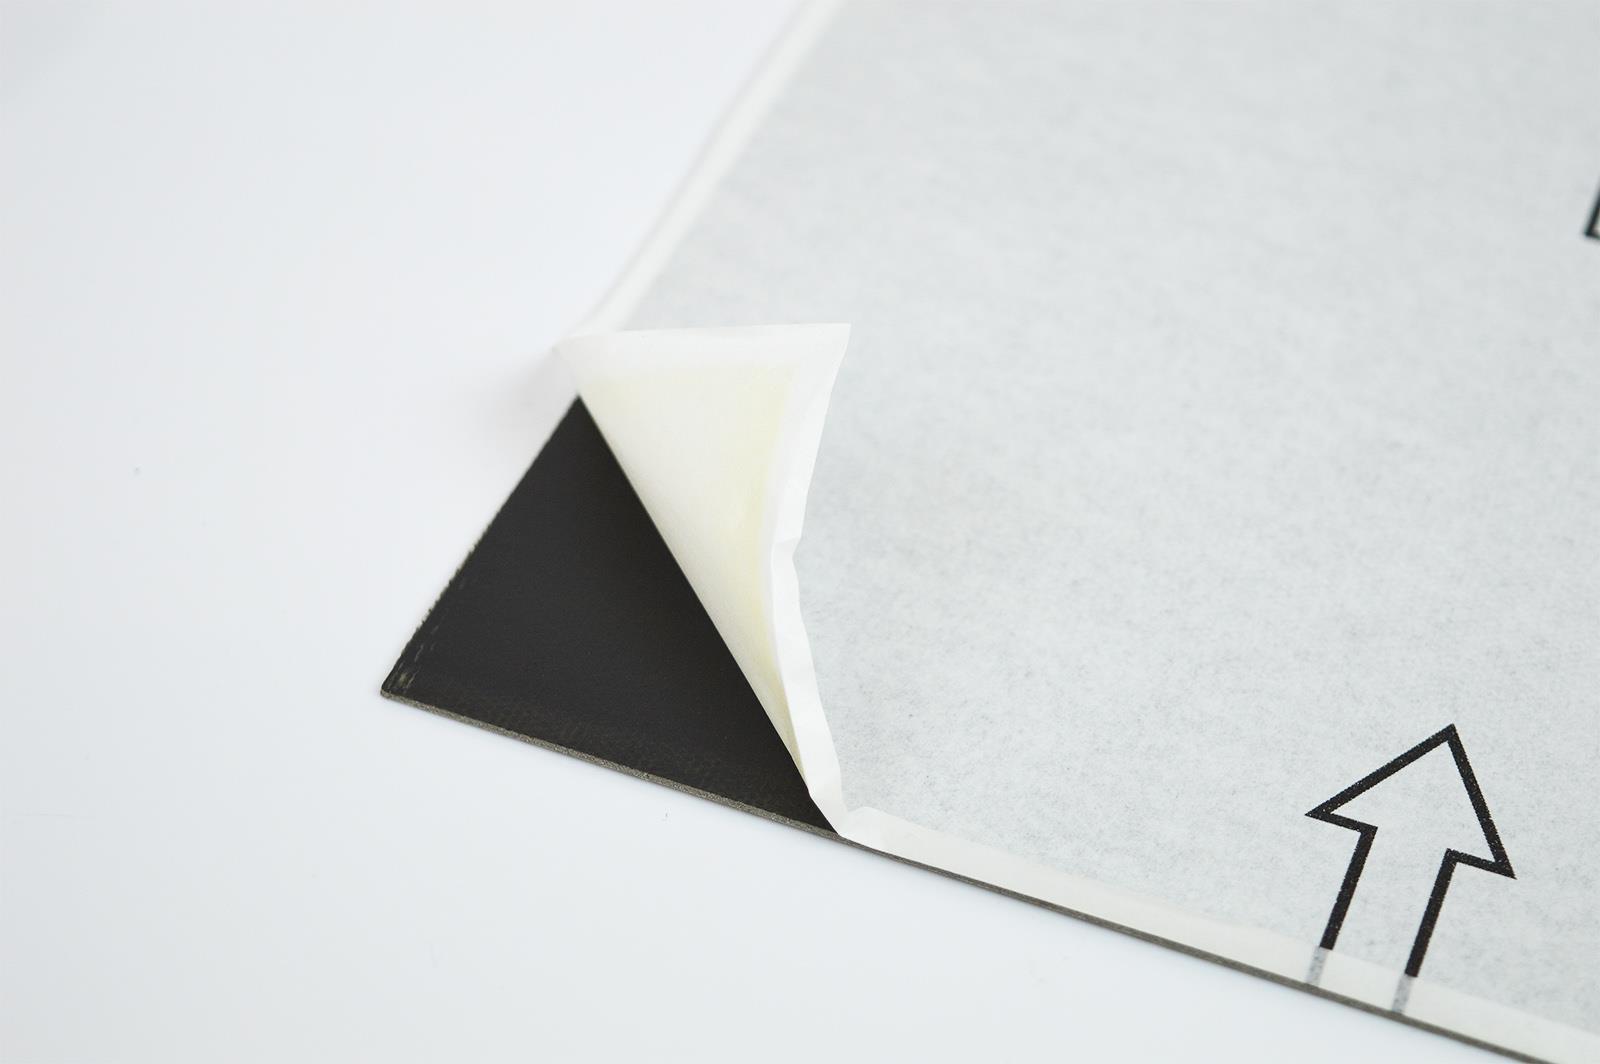 Floor-Tiles-Self-Adhesive-Vinyl-Flooring-Kitchen-Bathroom-Brown-Wood-Grain thumbnail 6